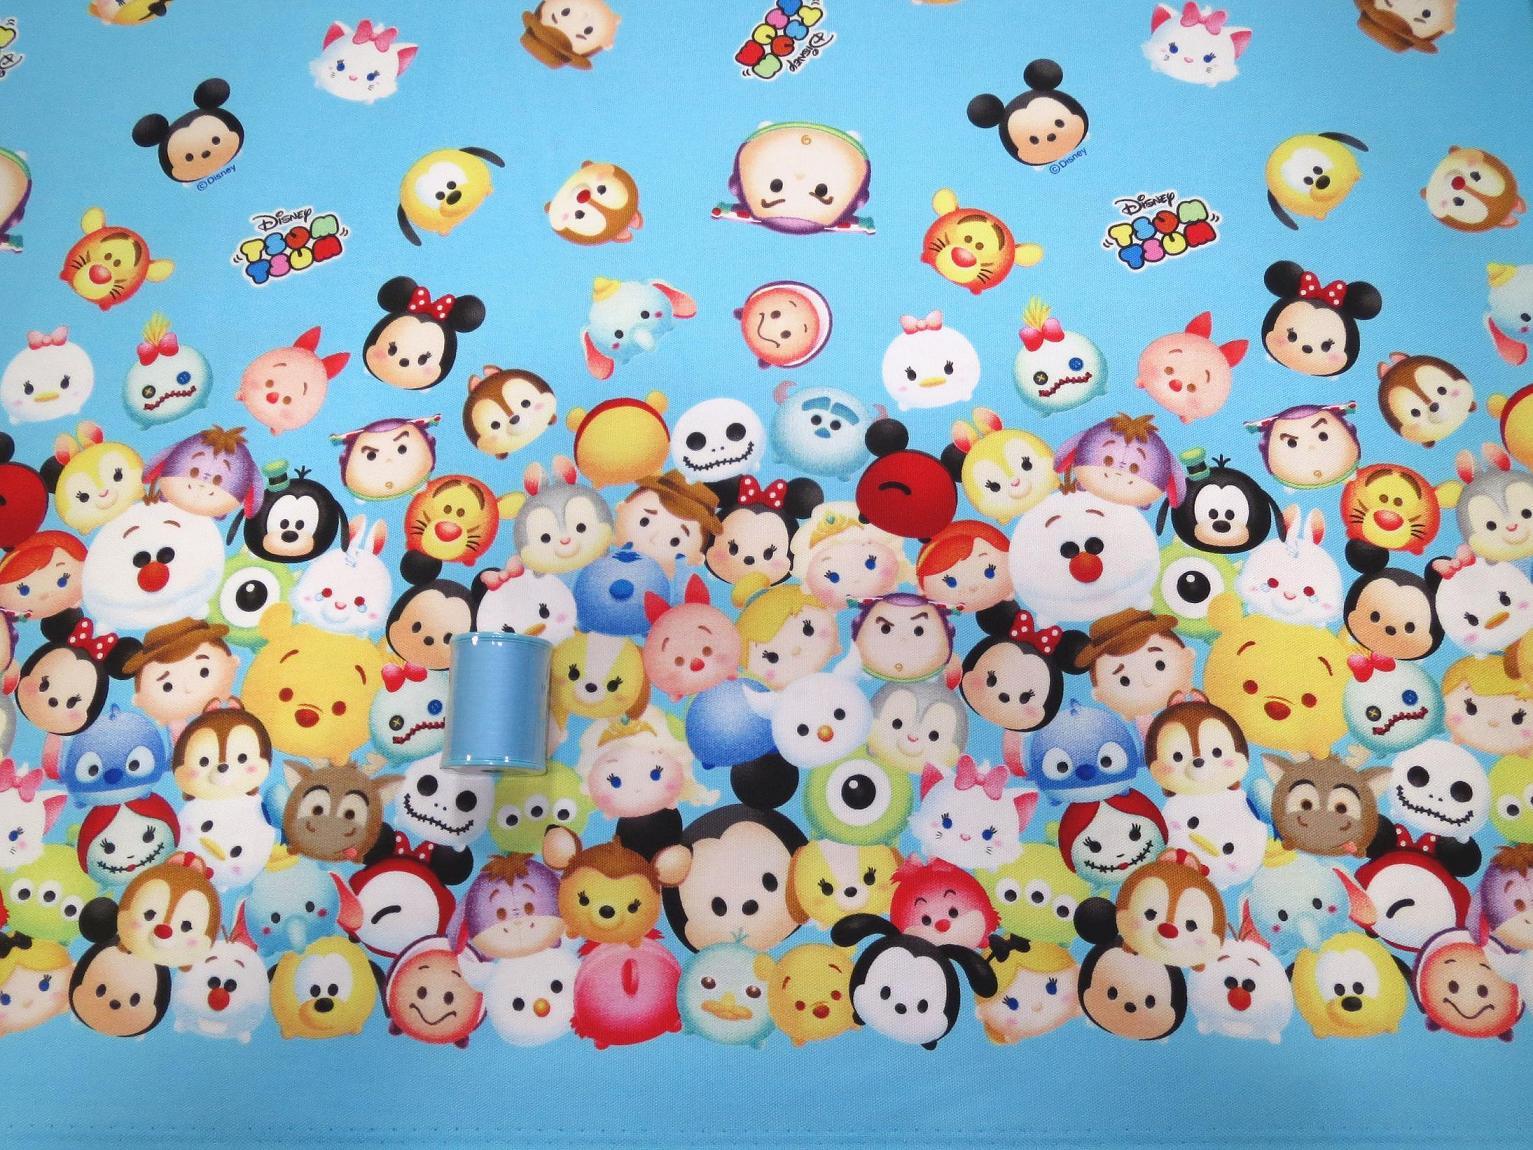 Cute Toothless Desktop Wallpaper 【楽天市場】【オックス】★50cm単位続けてカット★ディズニーツムツム サイドボーダー柄 【 ツムツム 生地